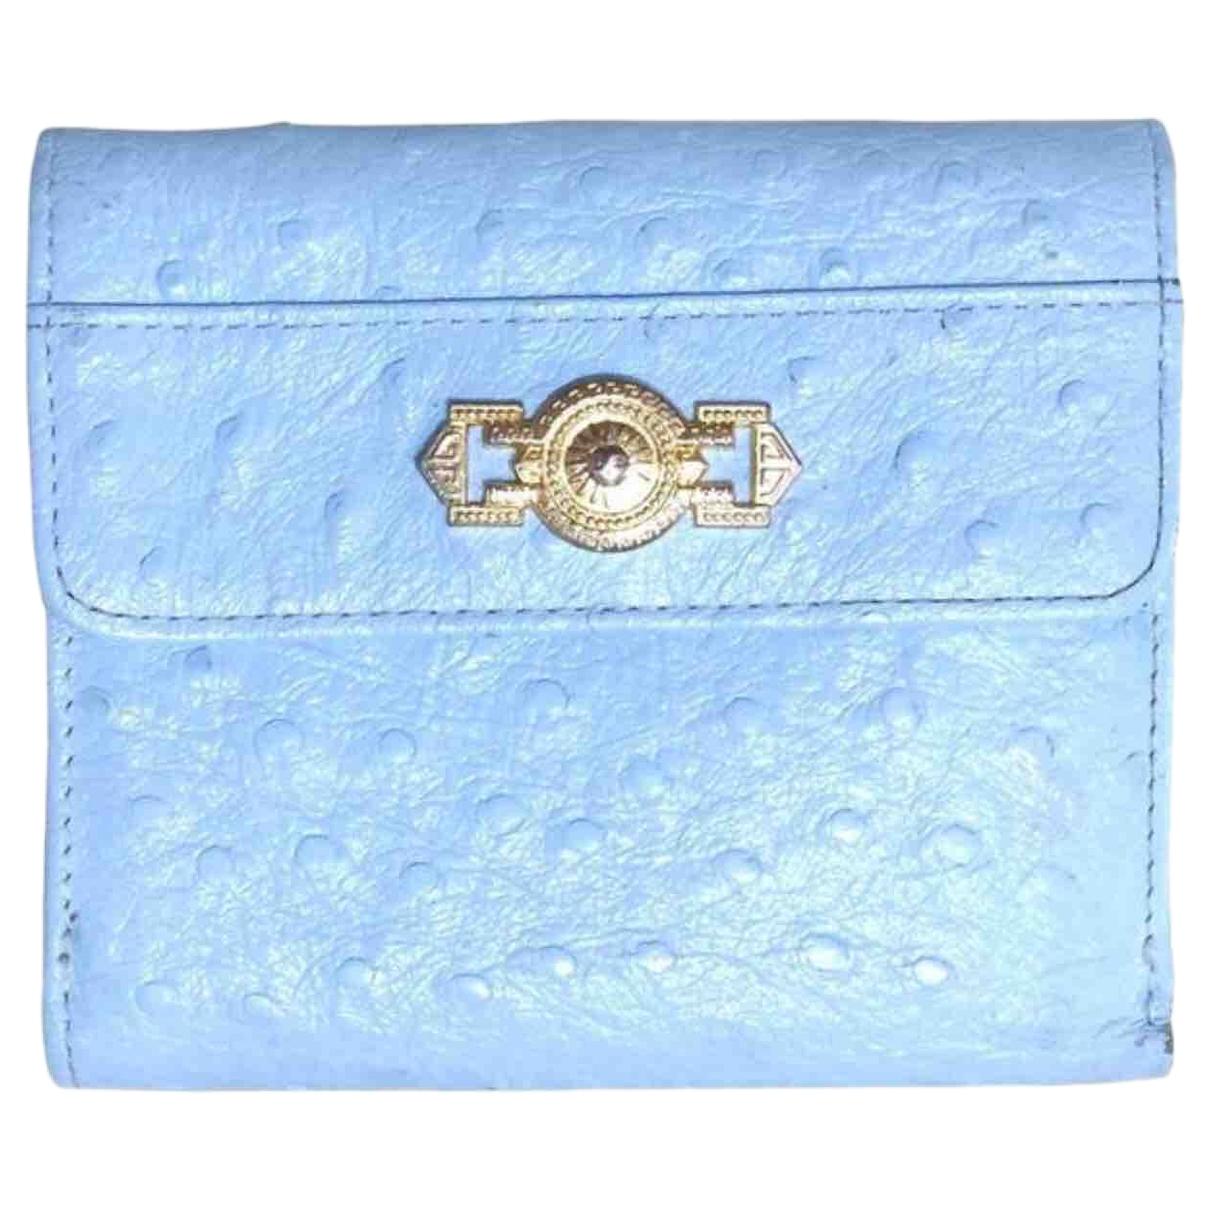 Gianni Versace \N Kleinlederwaren in  Blau Leder